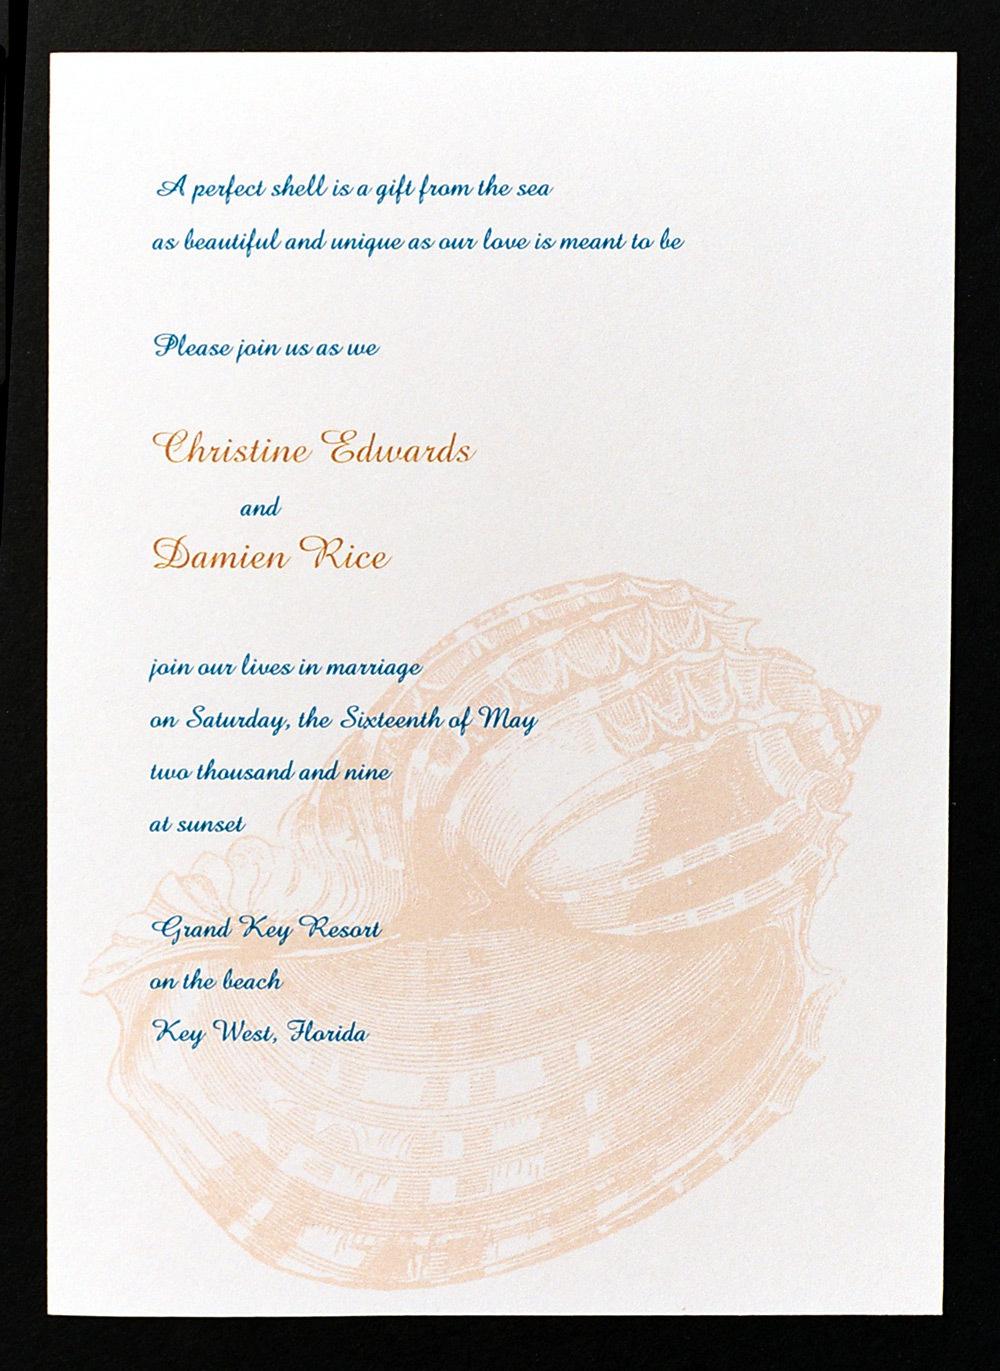 Invitations by ajalon